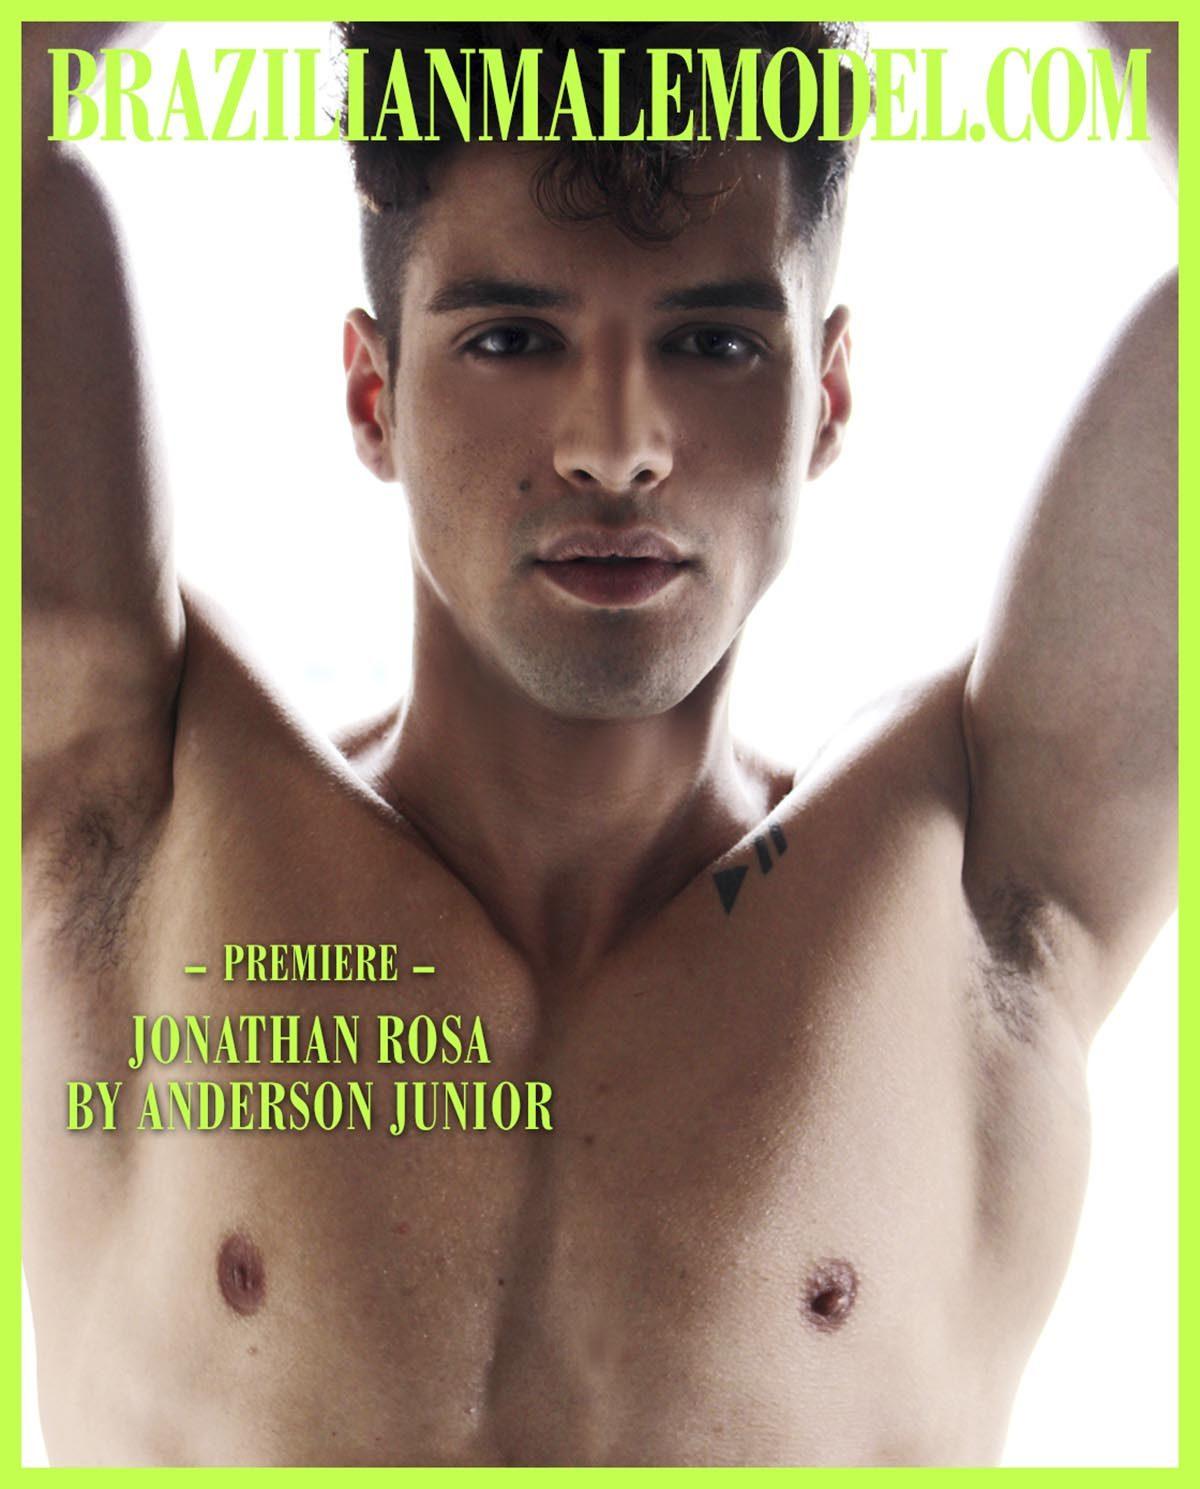 Jonathan Rosa by Anderson Junior